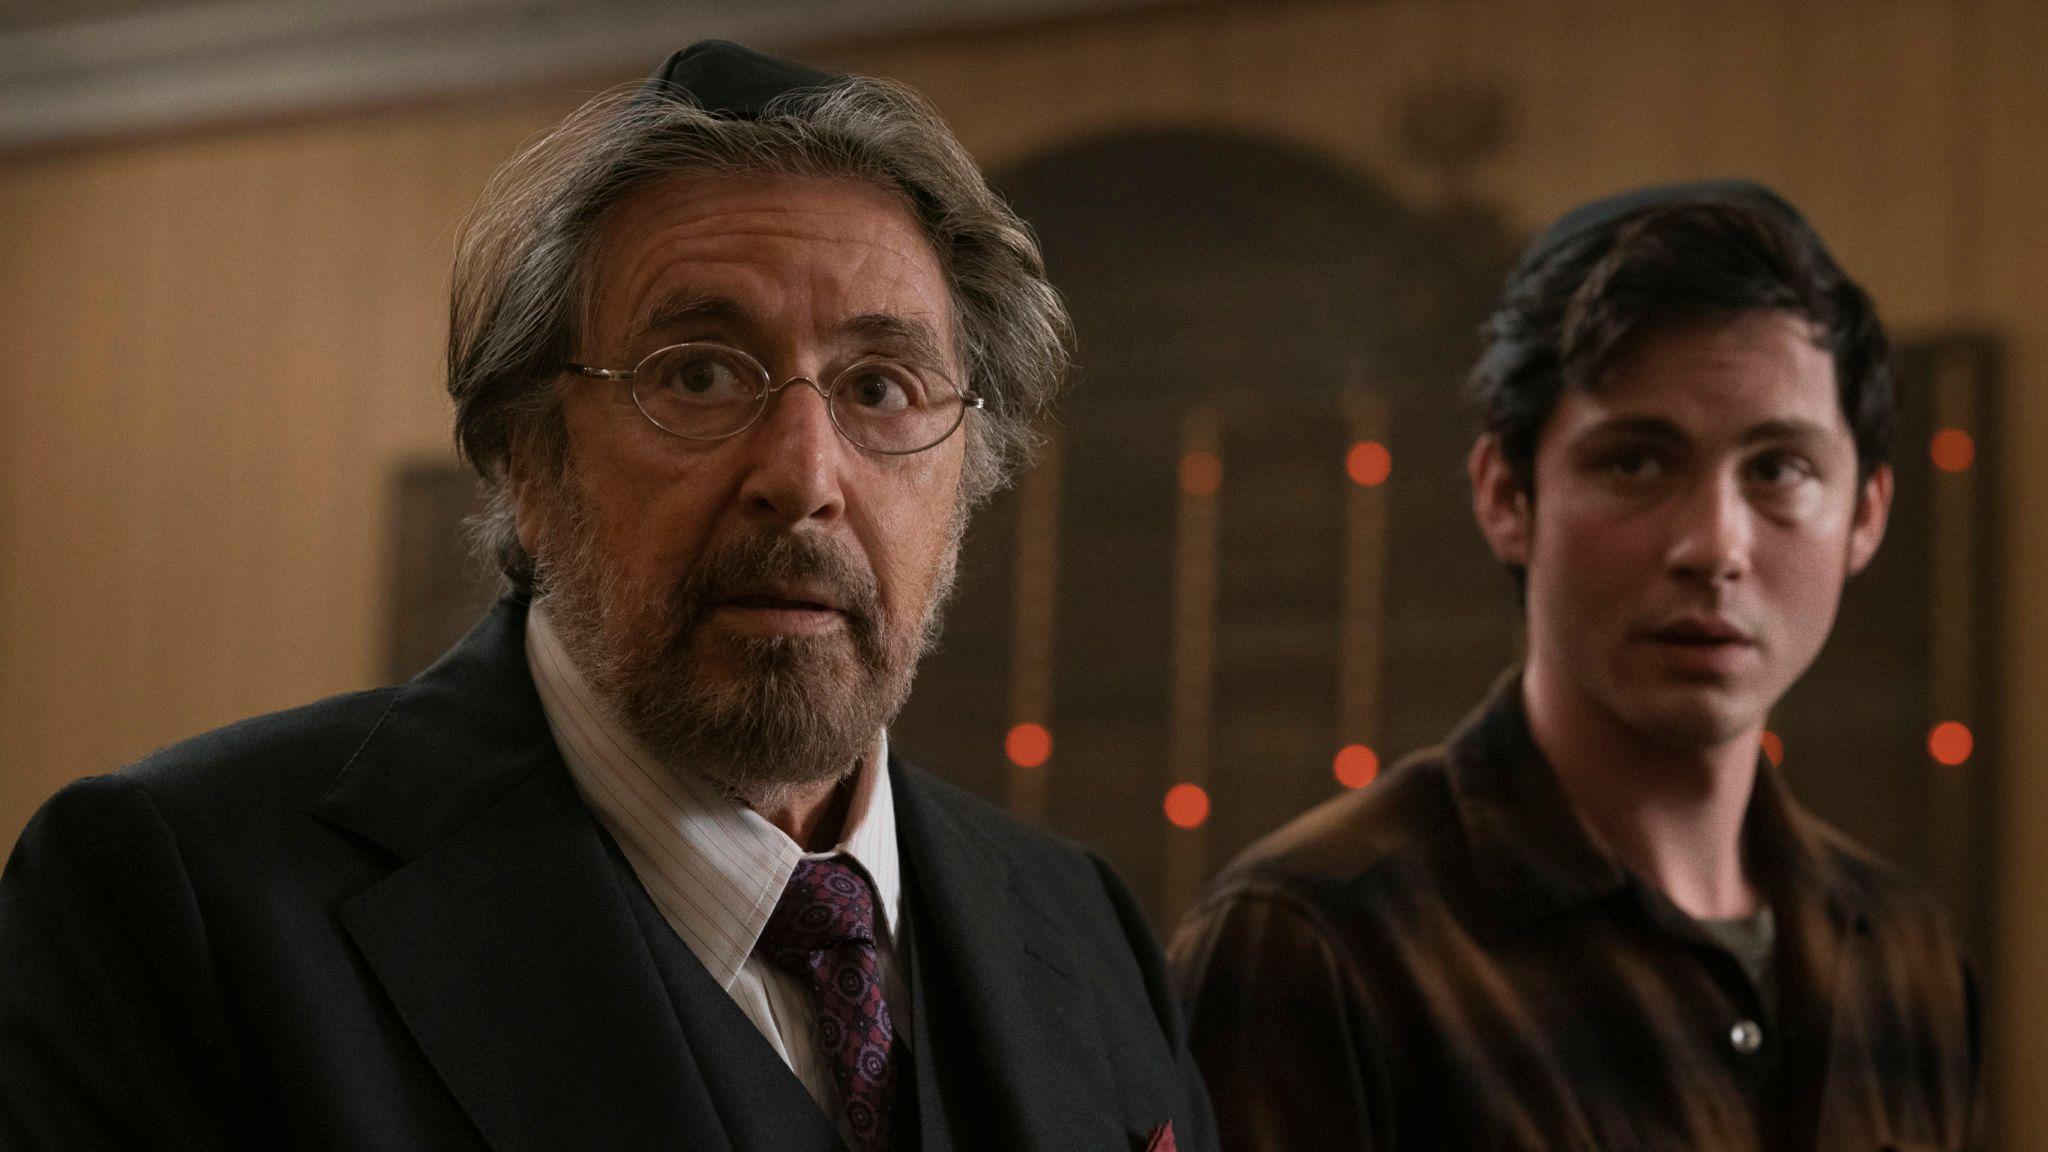 Al Pacino and Logan Lerman star in Hunters. Pic: Amazon Prime Video